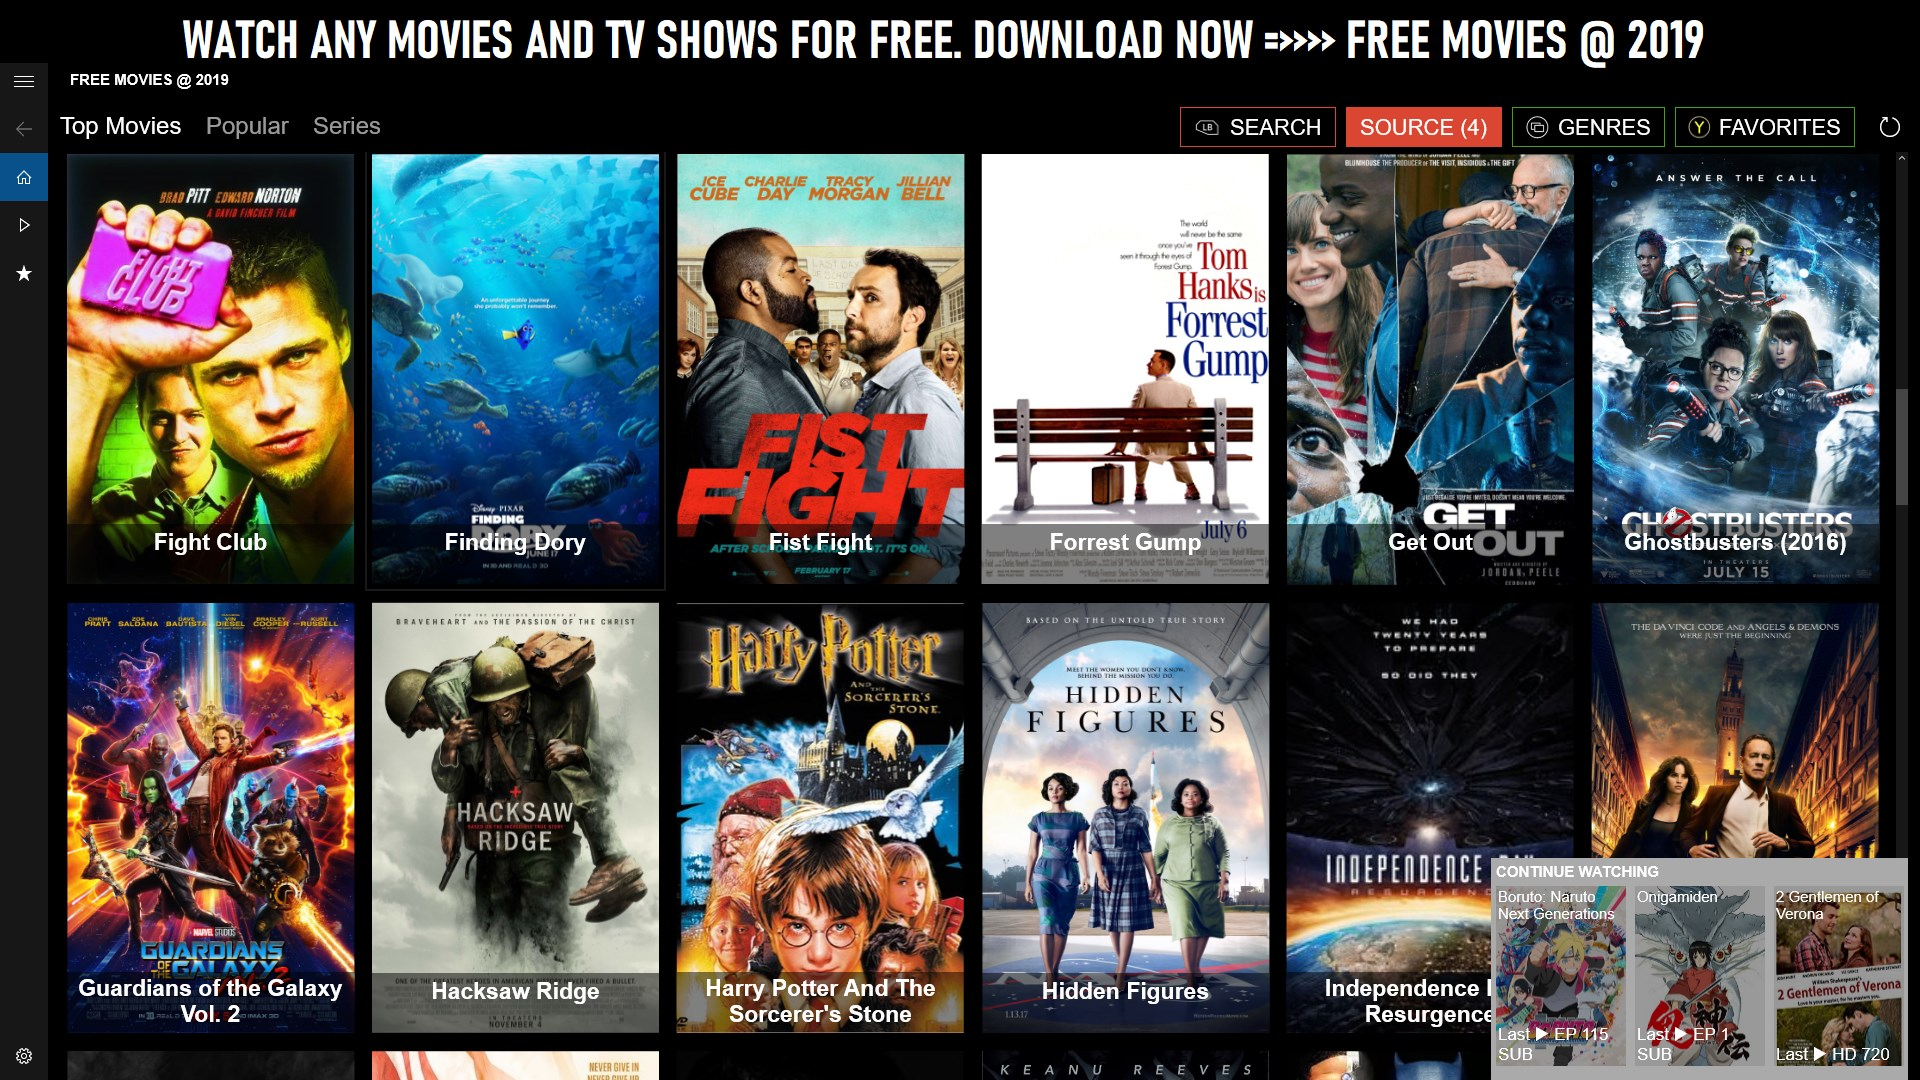 images?q=tbn:ANd9GcQh_l3eQ5xwiPy07kGEXjmjgmBKBRB7H2mRxCGhv1tFWg5c_mWT Trends For Movies 2019 @koolgadgetz.com.info